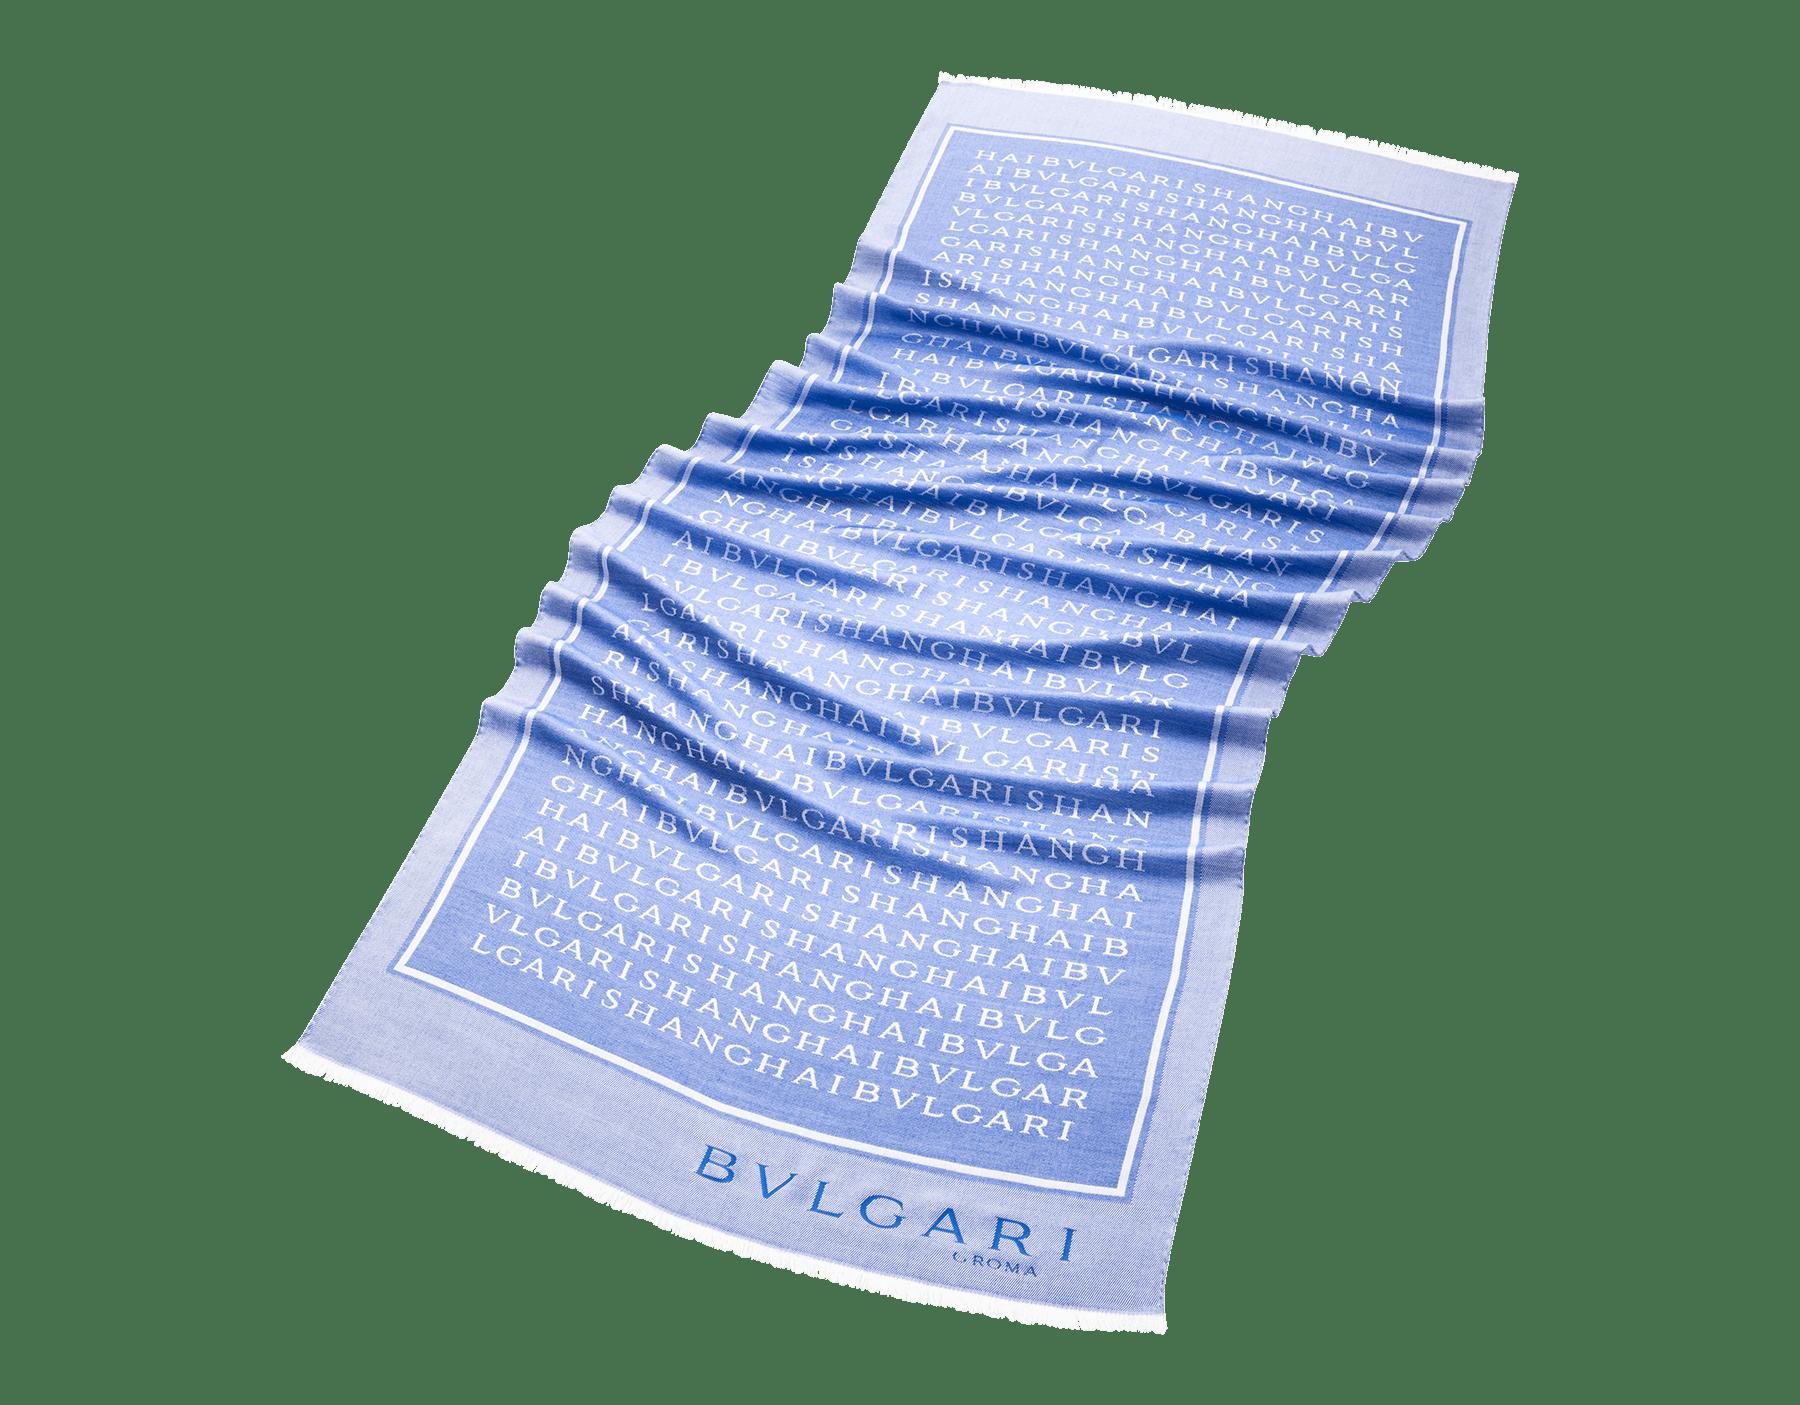 Stola Lettere Street zaffiro royal in pregiato tessuto di seta e lana. 243989 image 1